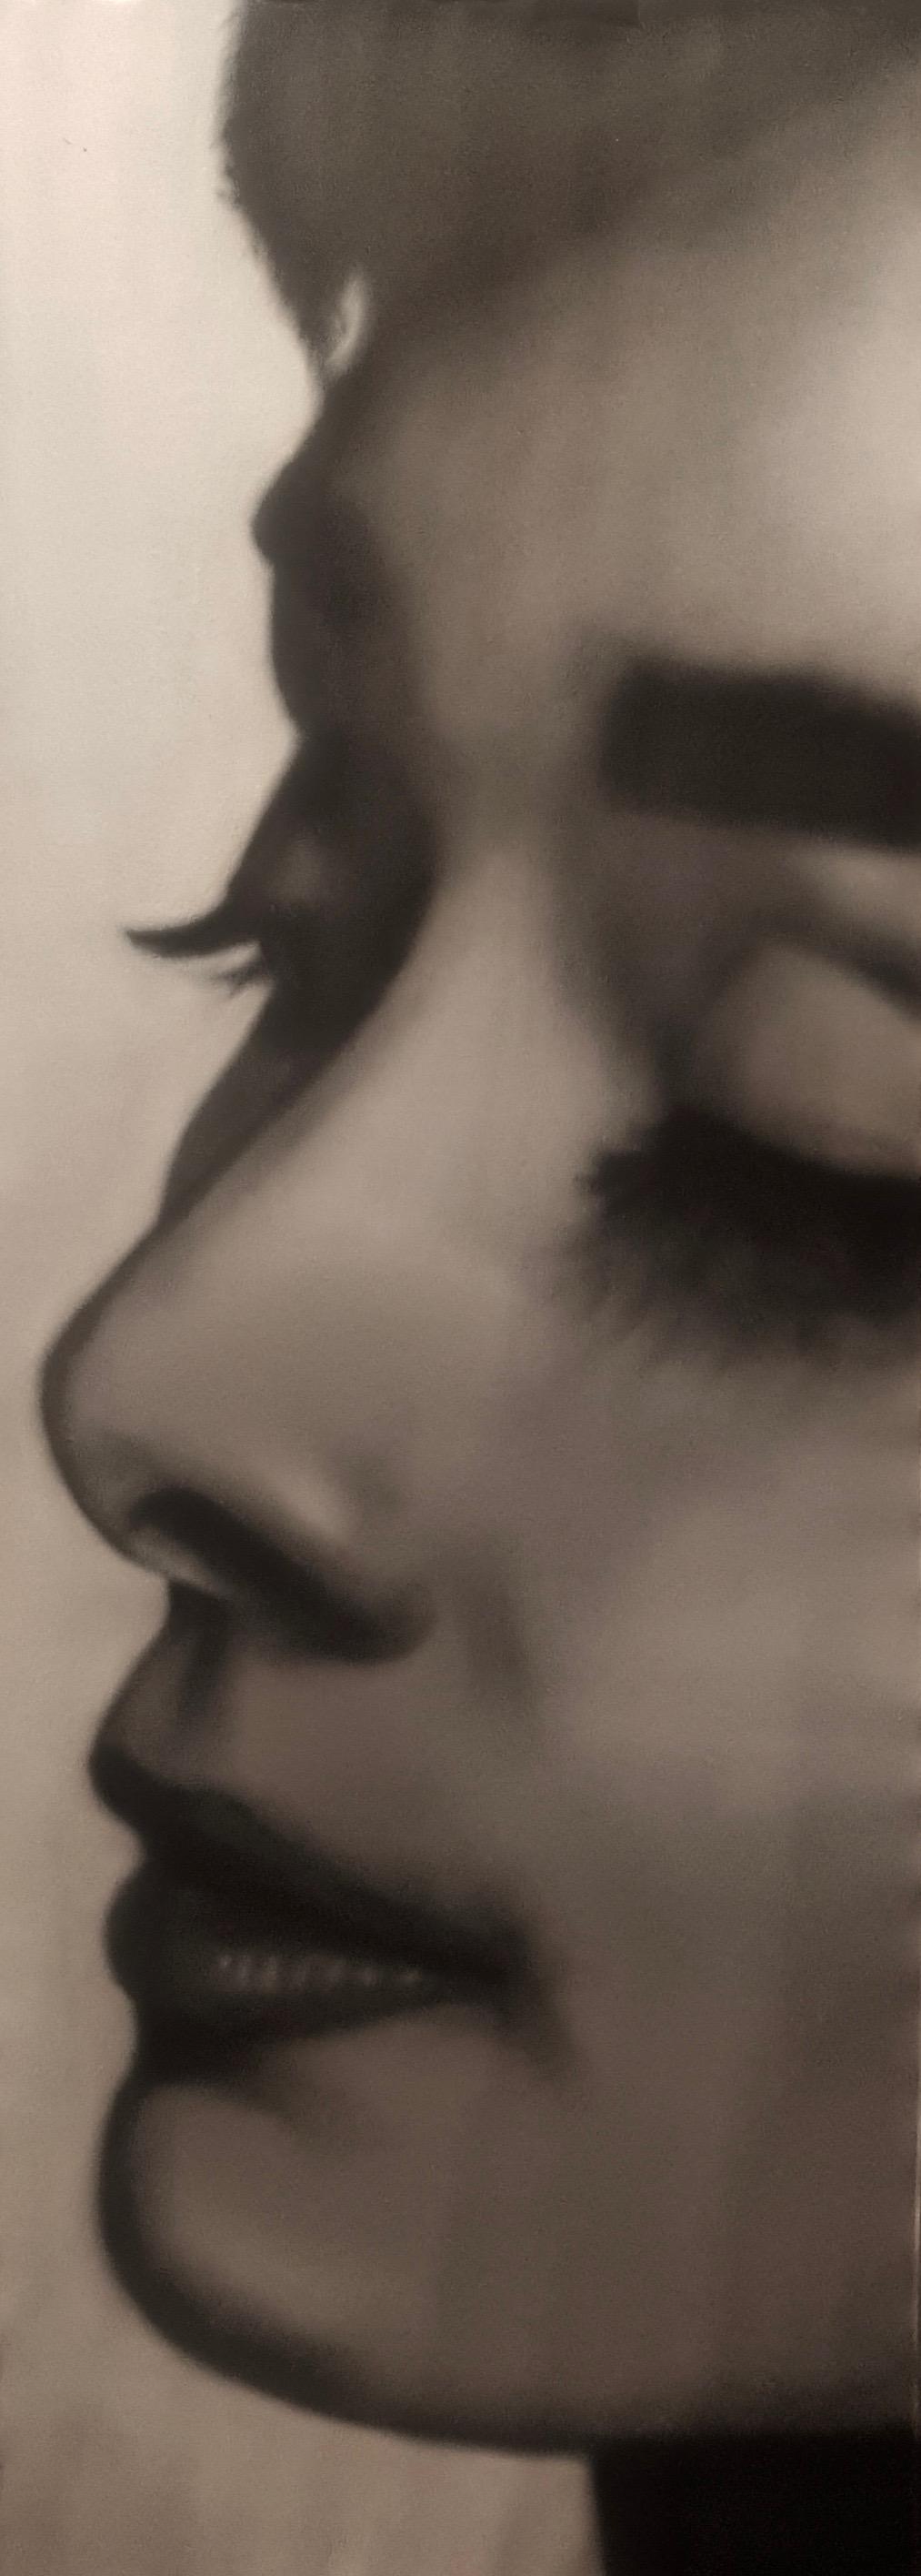 Audrey Hepburn portrait by savagewerx